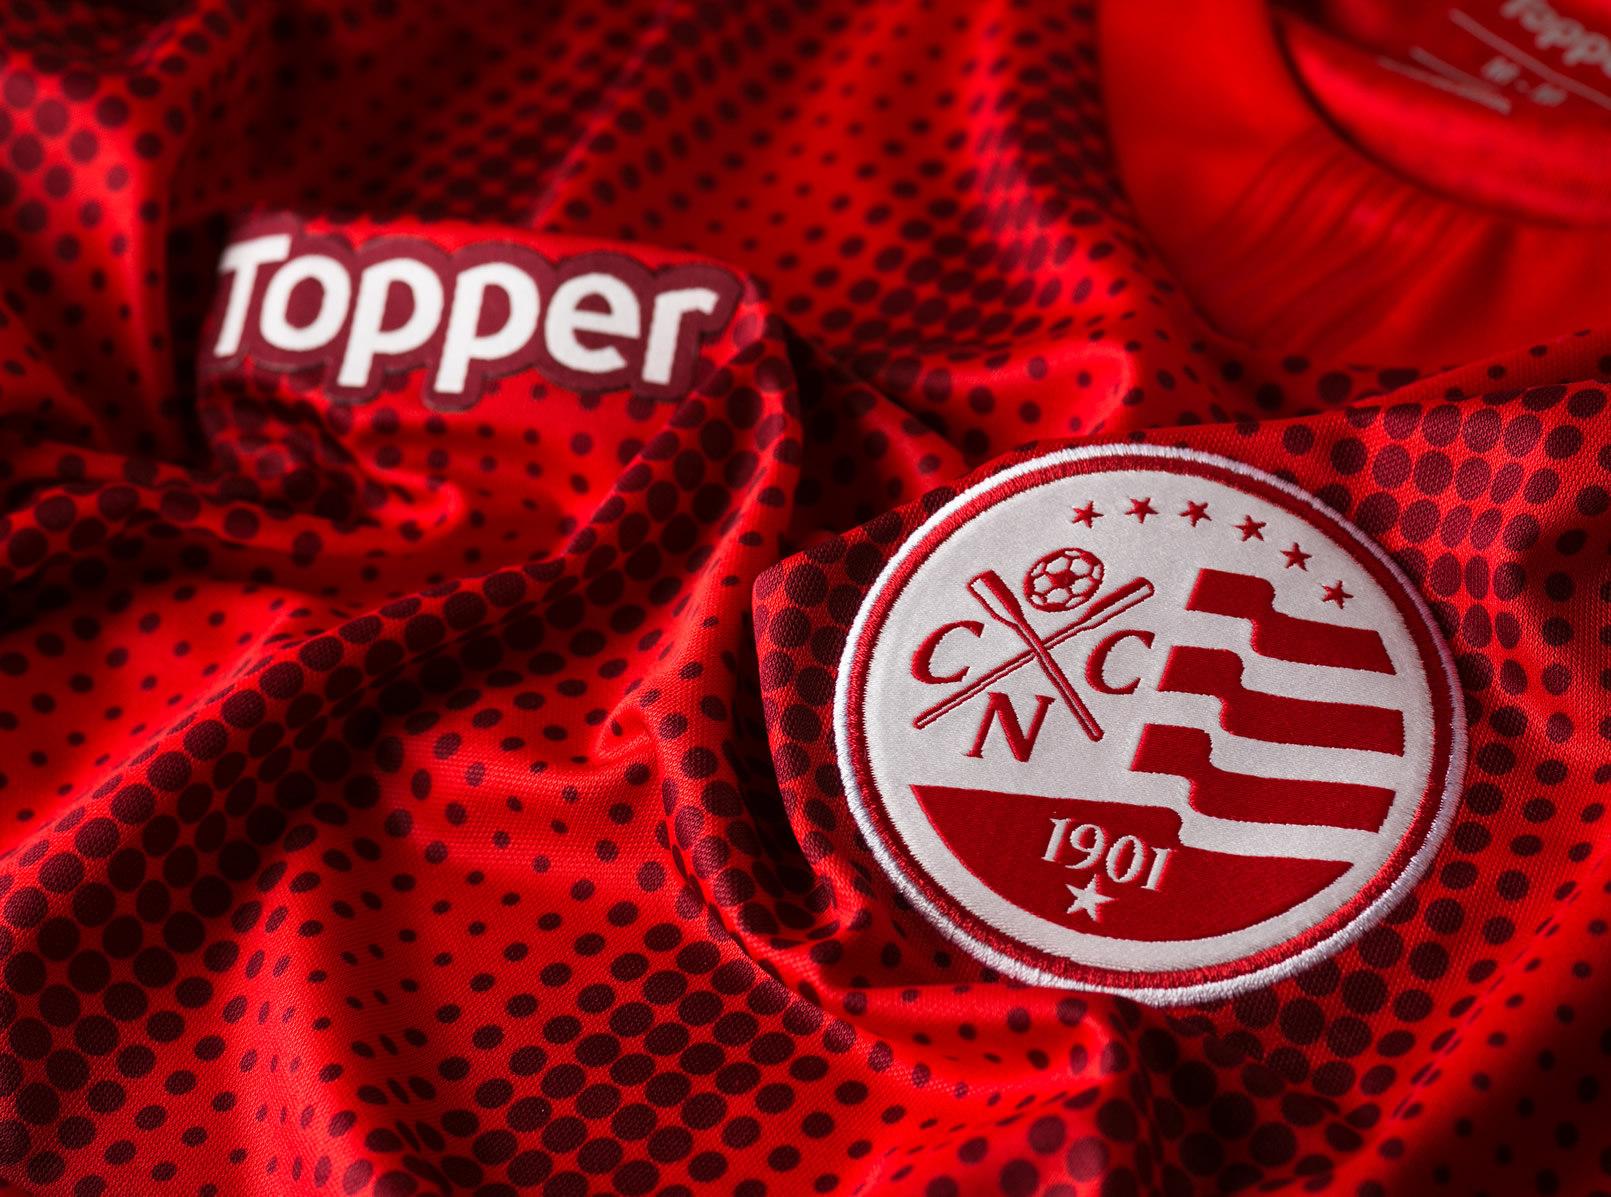 Tercera camiseta del Náutico 2018/19 | Imagen Gentileza Topper